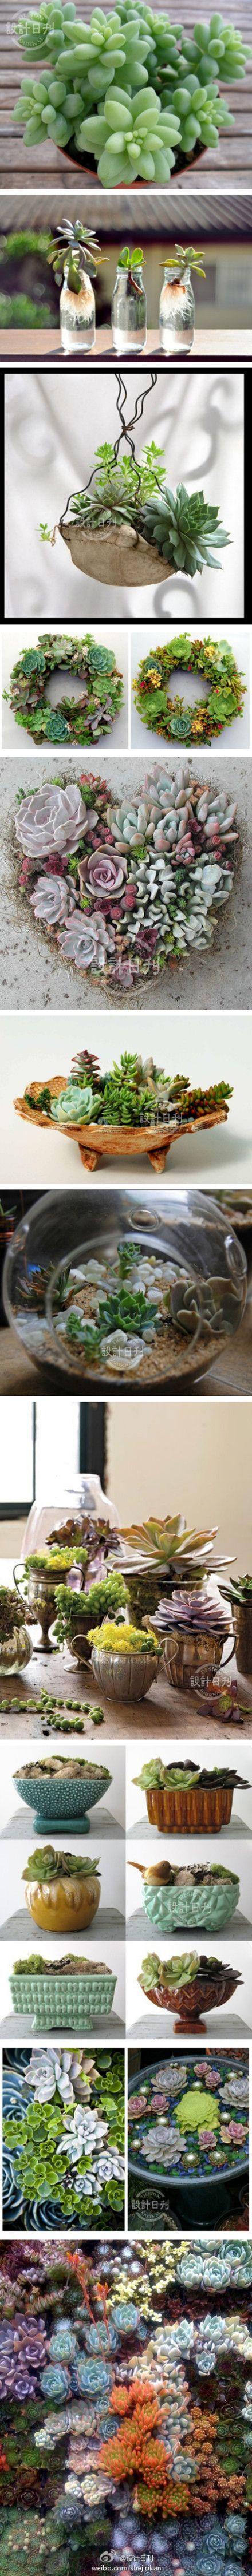 Helgadottir Salmon ! Succulents! by weibo.com/shejirikan